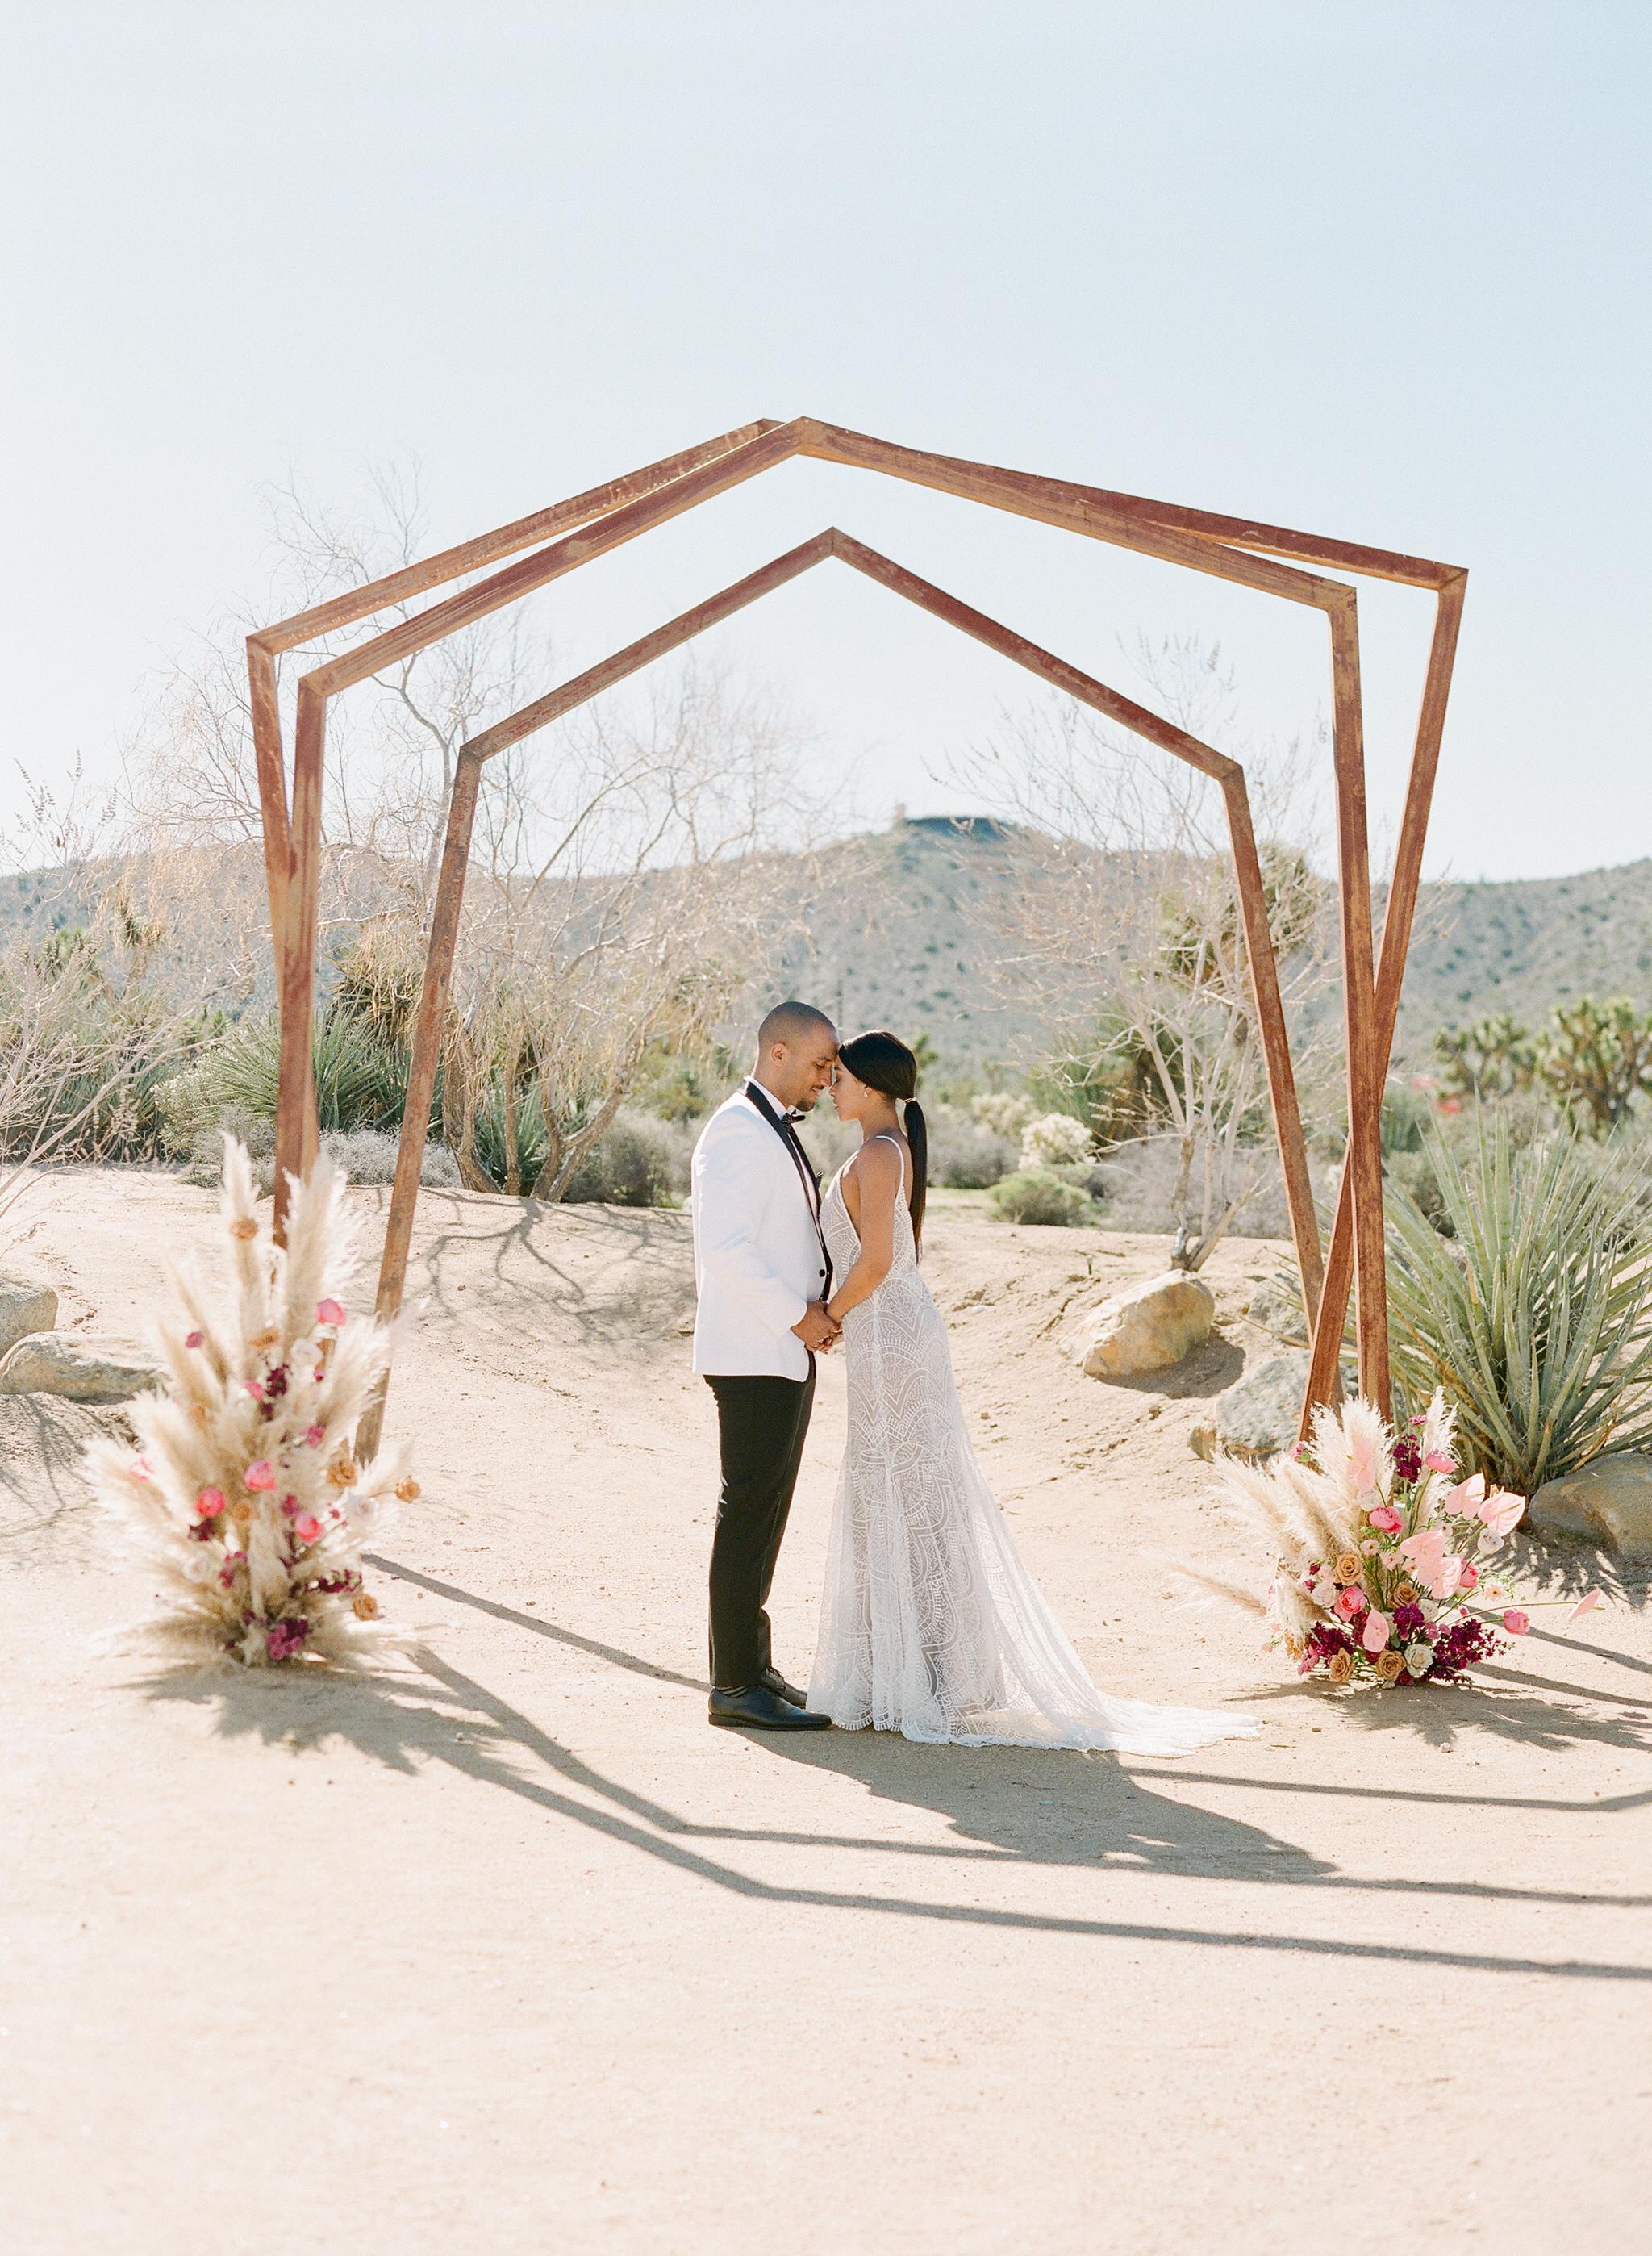 Savan Photography I Mon Amie Bridal Salon I Wtoo by Watters dress I Stitch + Tie tux I Oak + Amble flowers